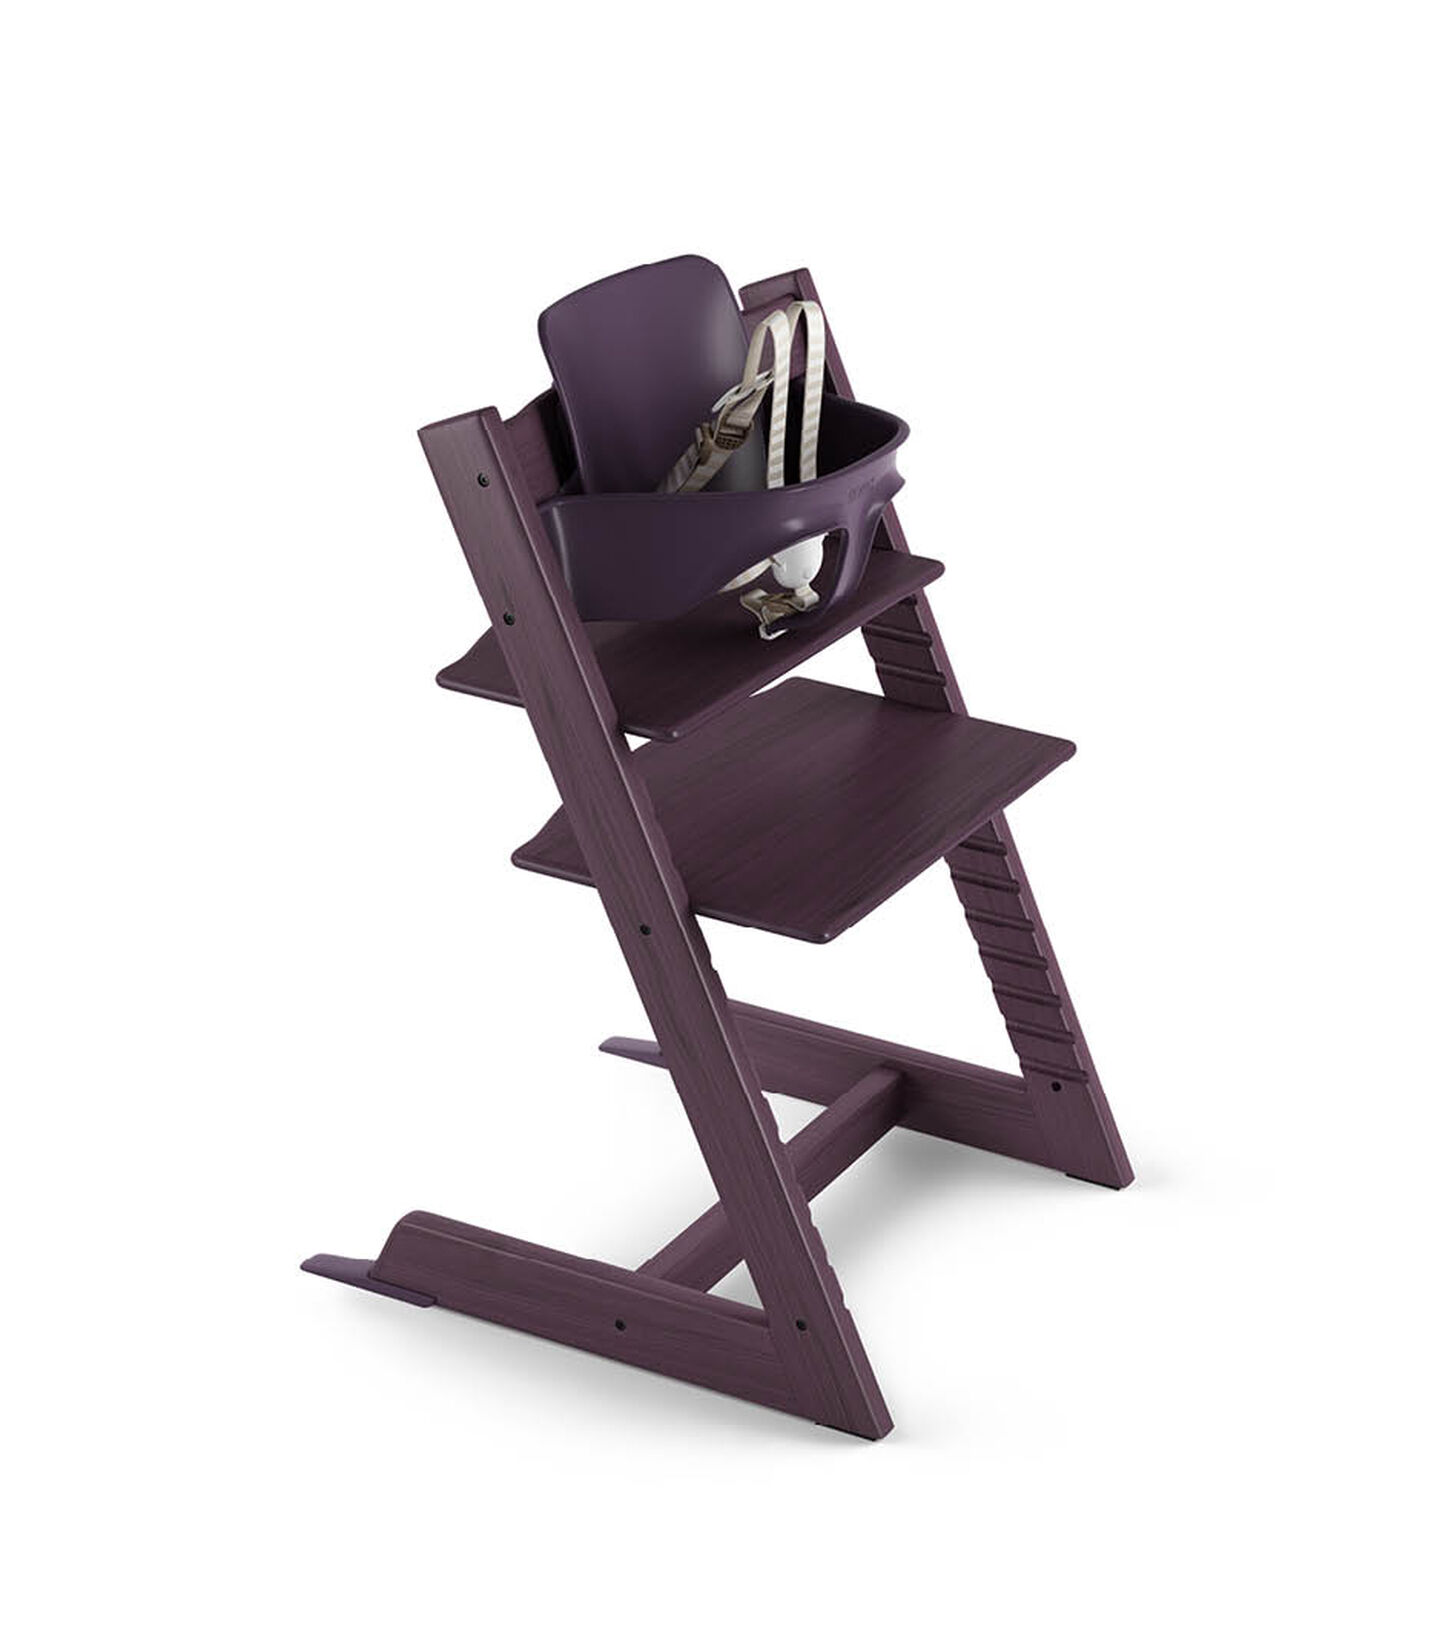 Tripp Trapp® Baby Set Plum Purple, Plum Purple, mainview view 1